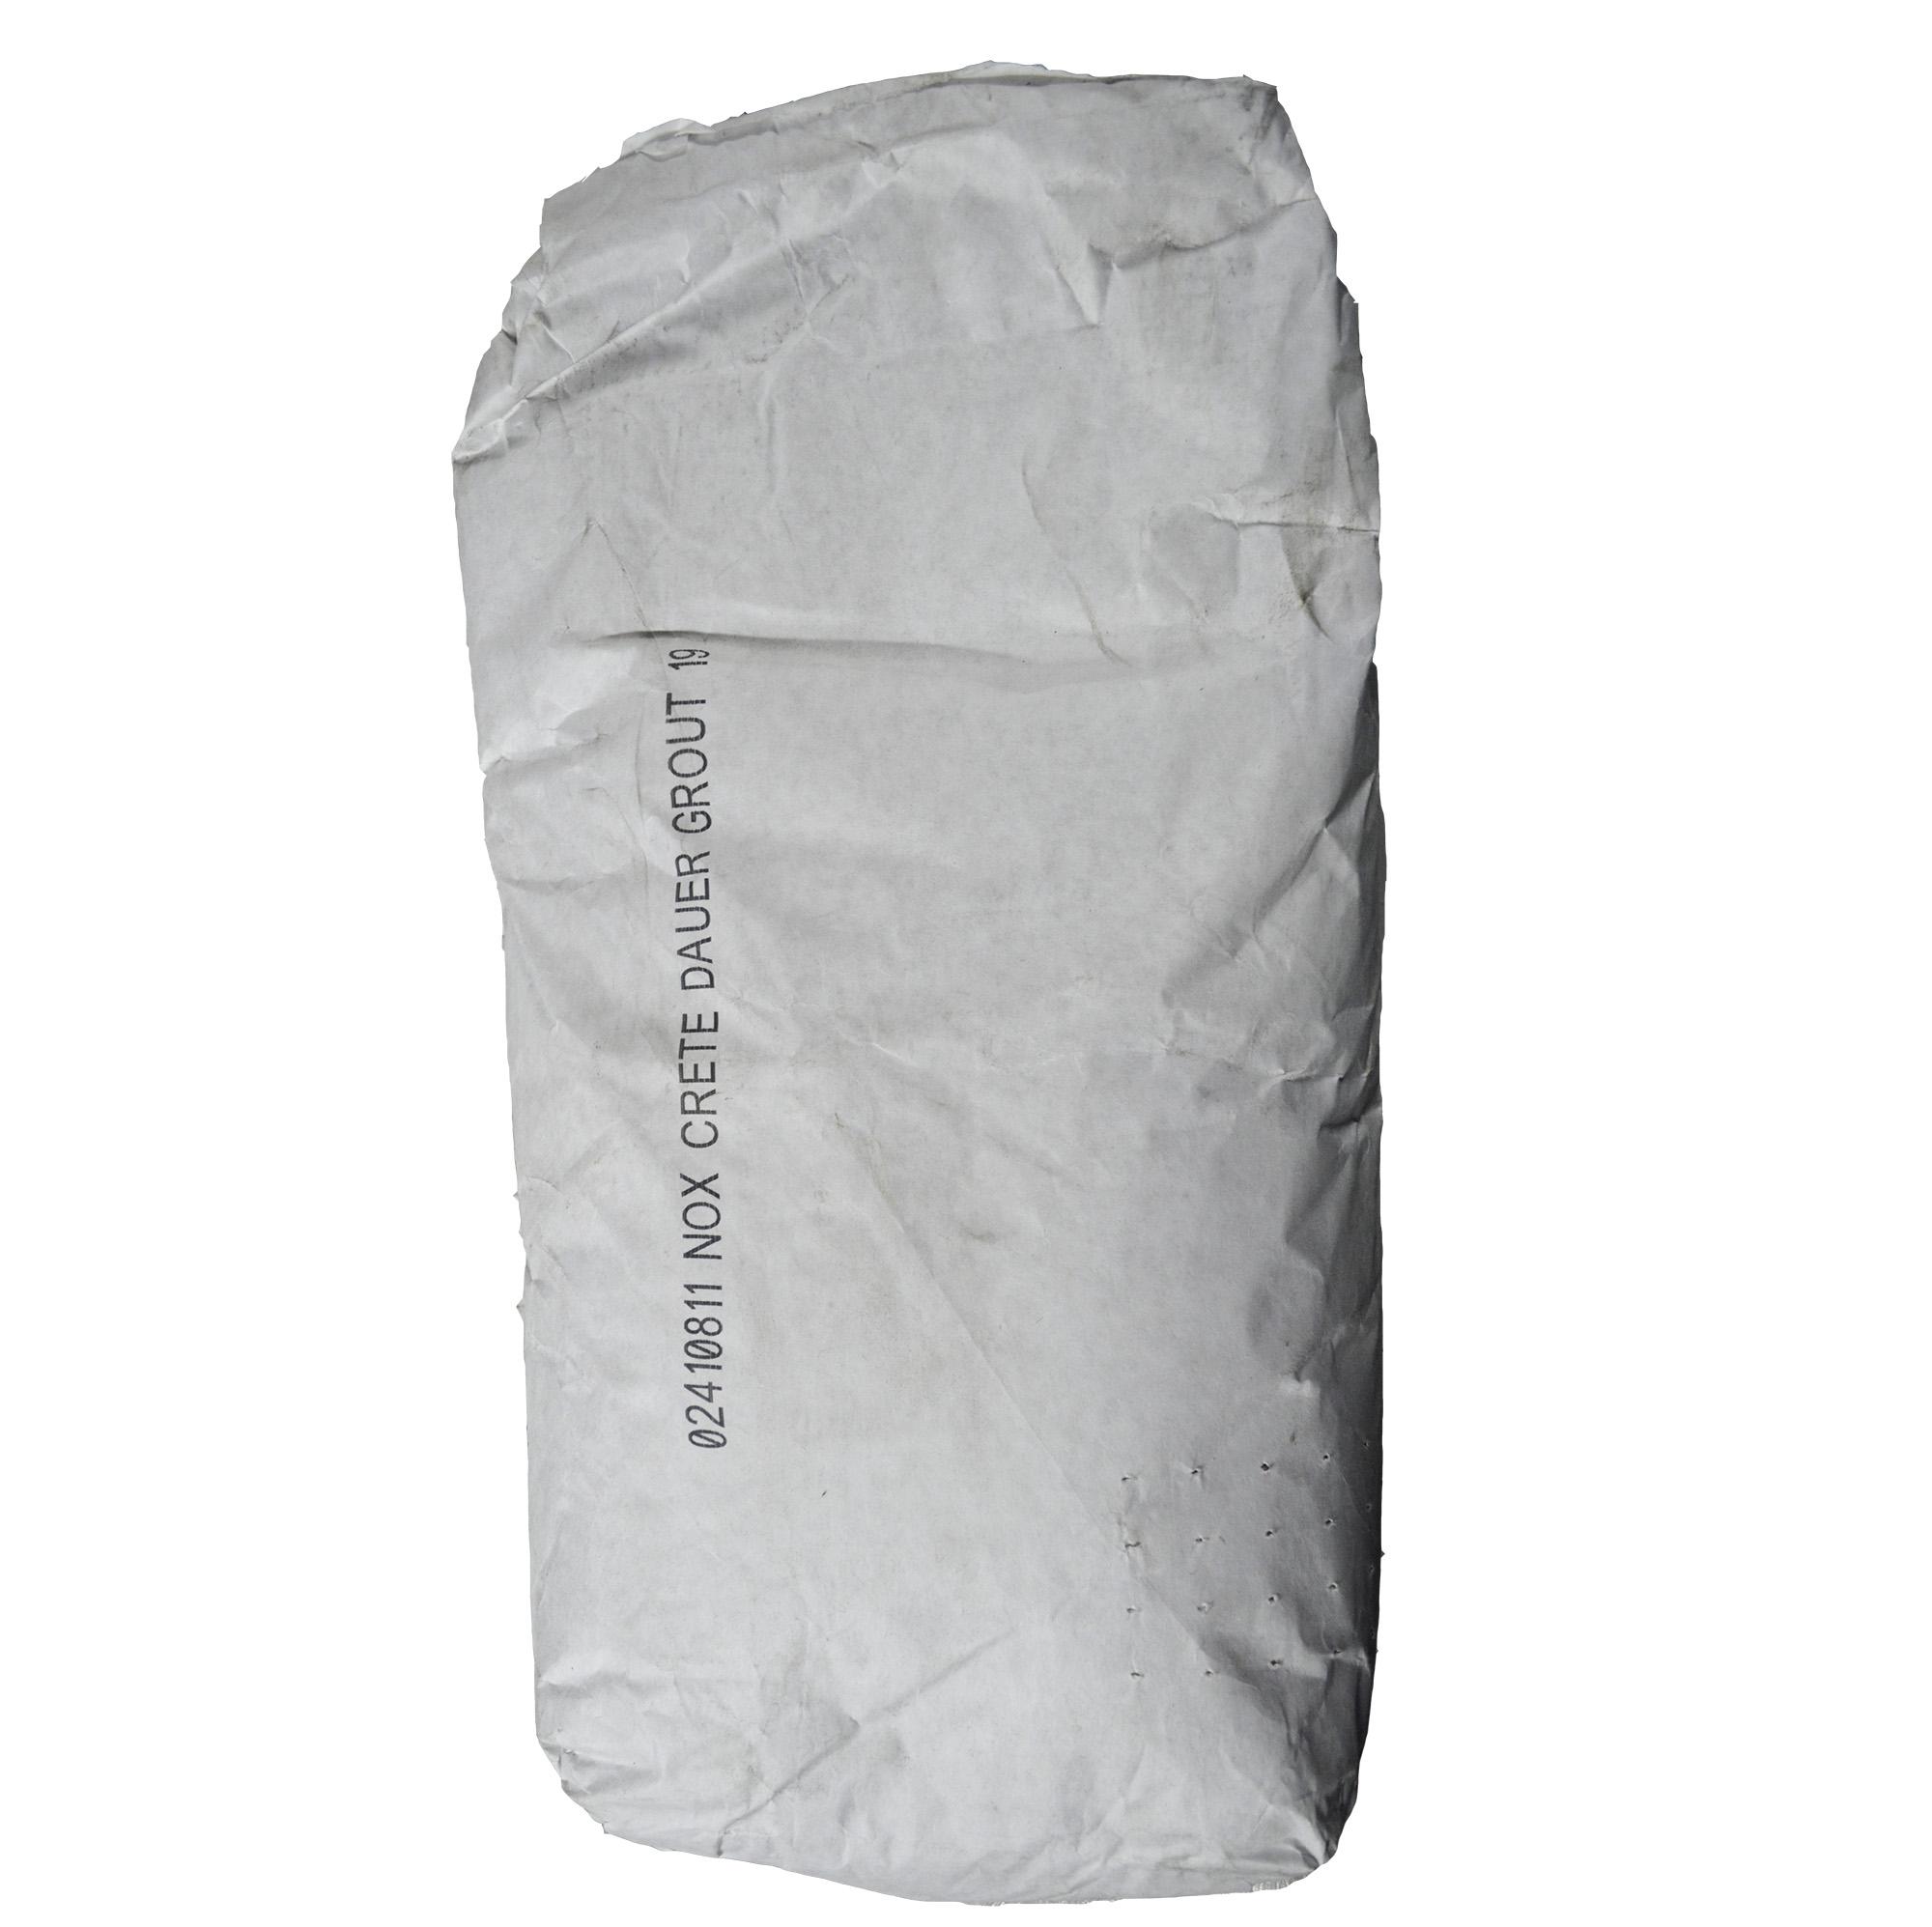 Epoxy/Polyurethane Copolymer Mortar